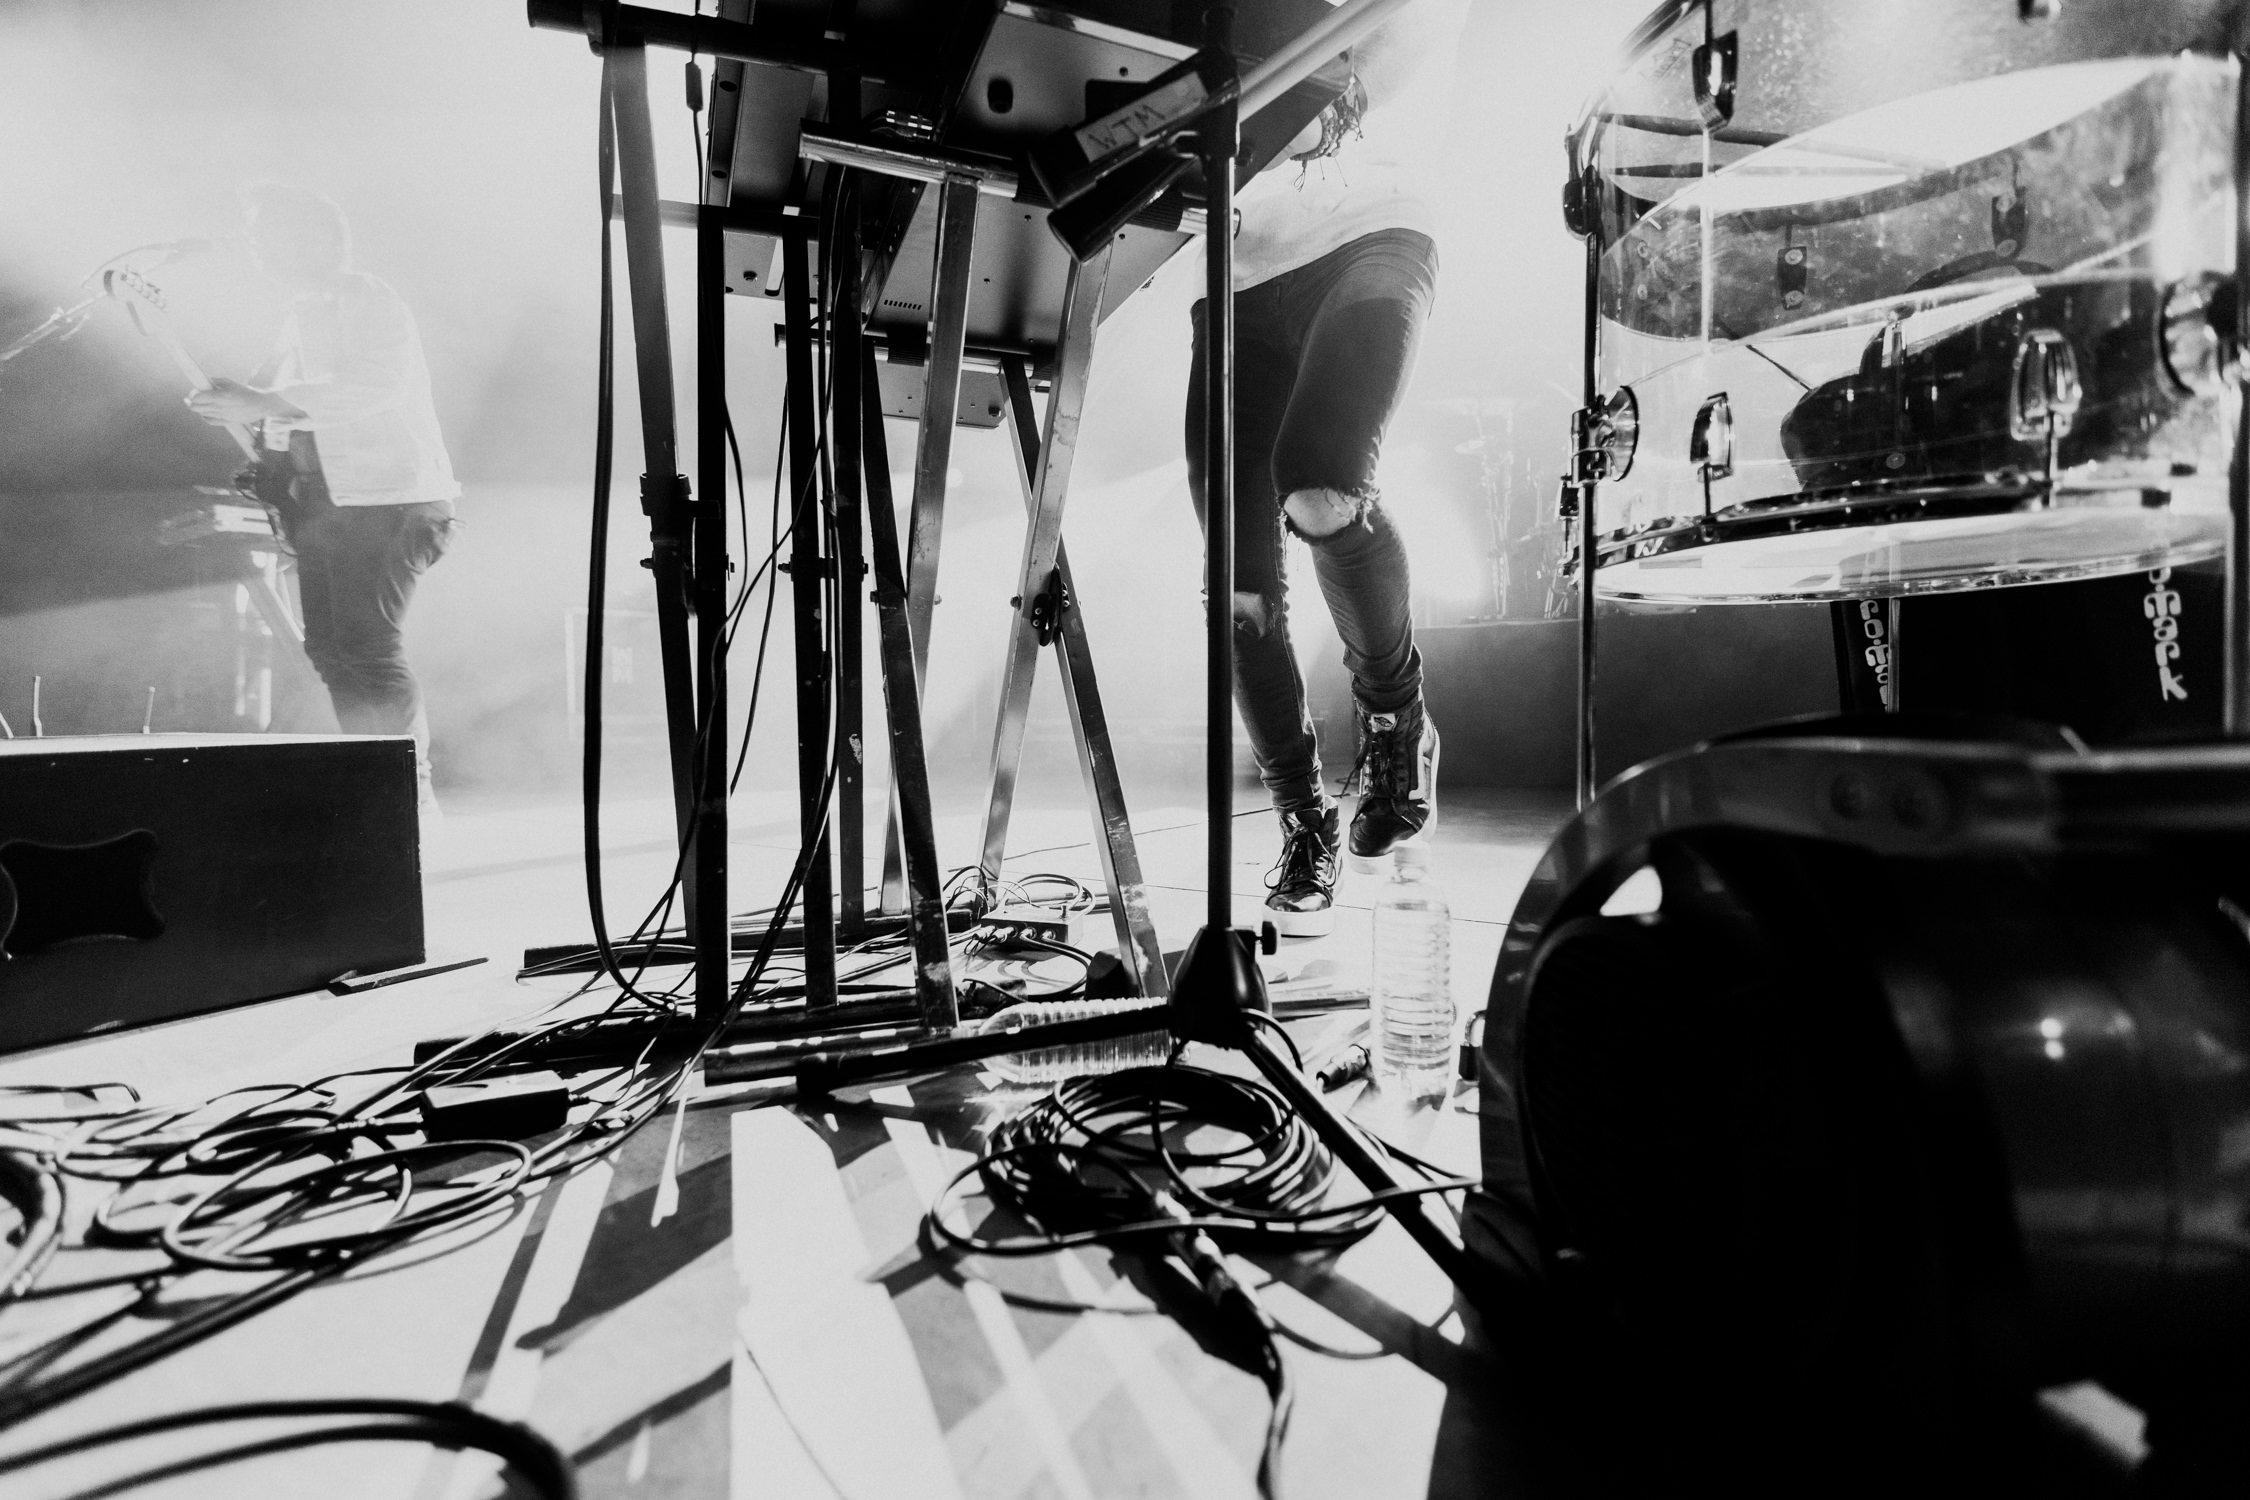 concert-stage-singer-feet-AnnaLeeMedia